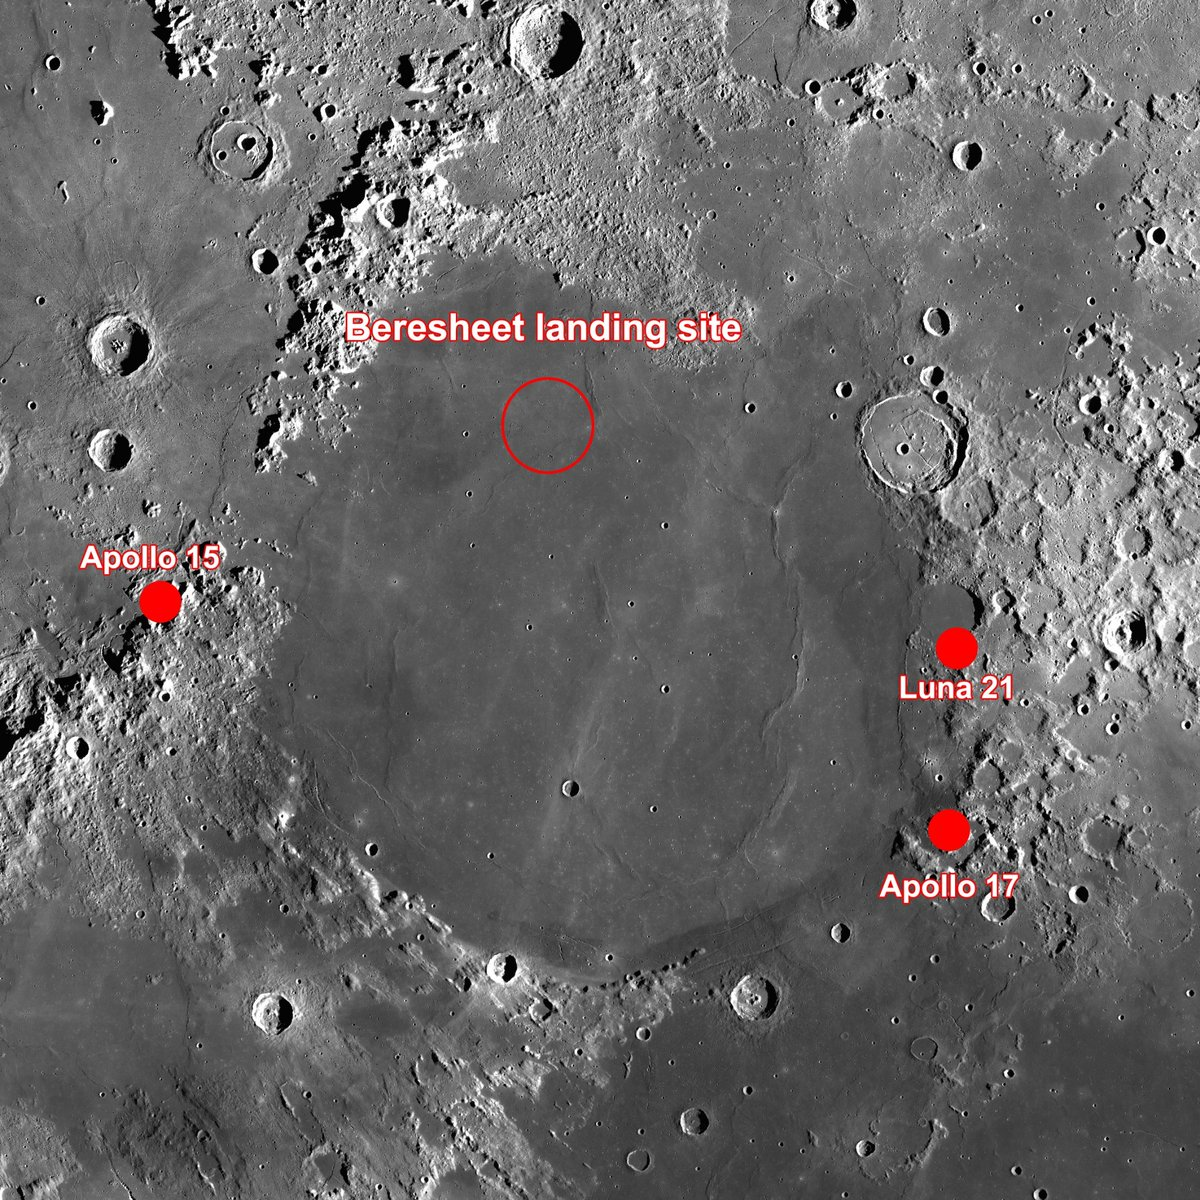 Лунная миссия «Берешит» — есть посадка на Луну (технически) - 101